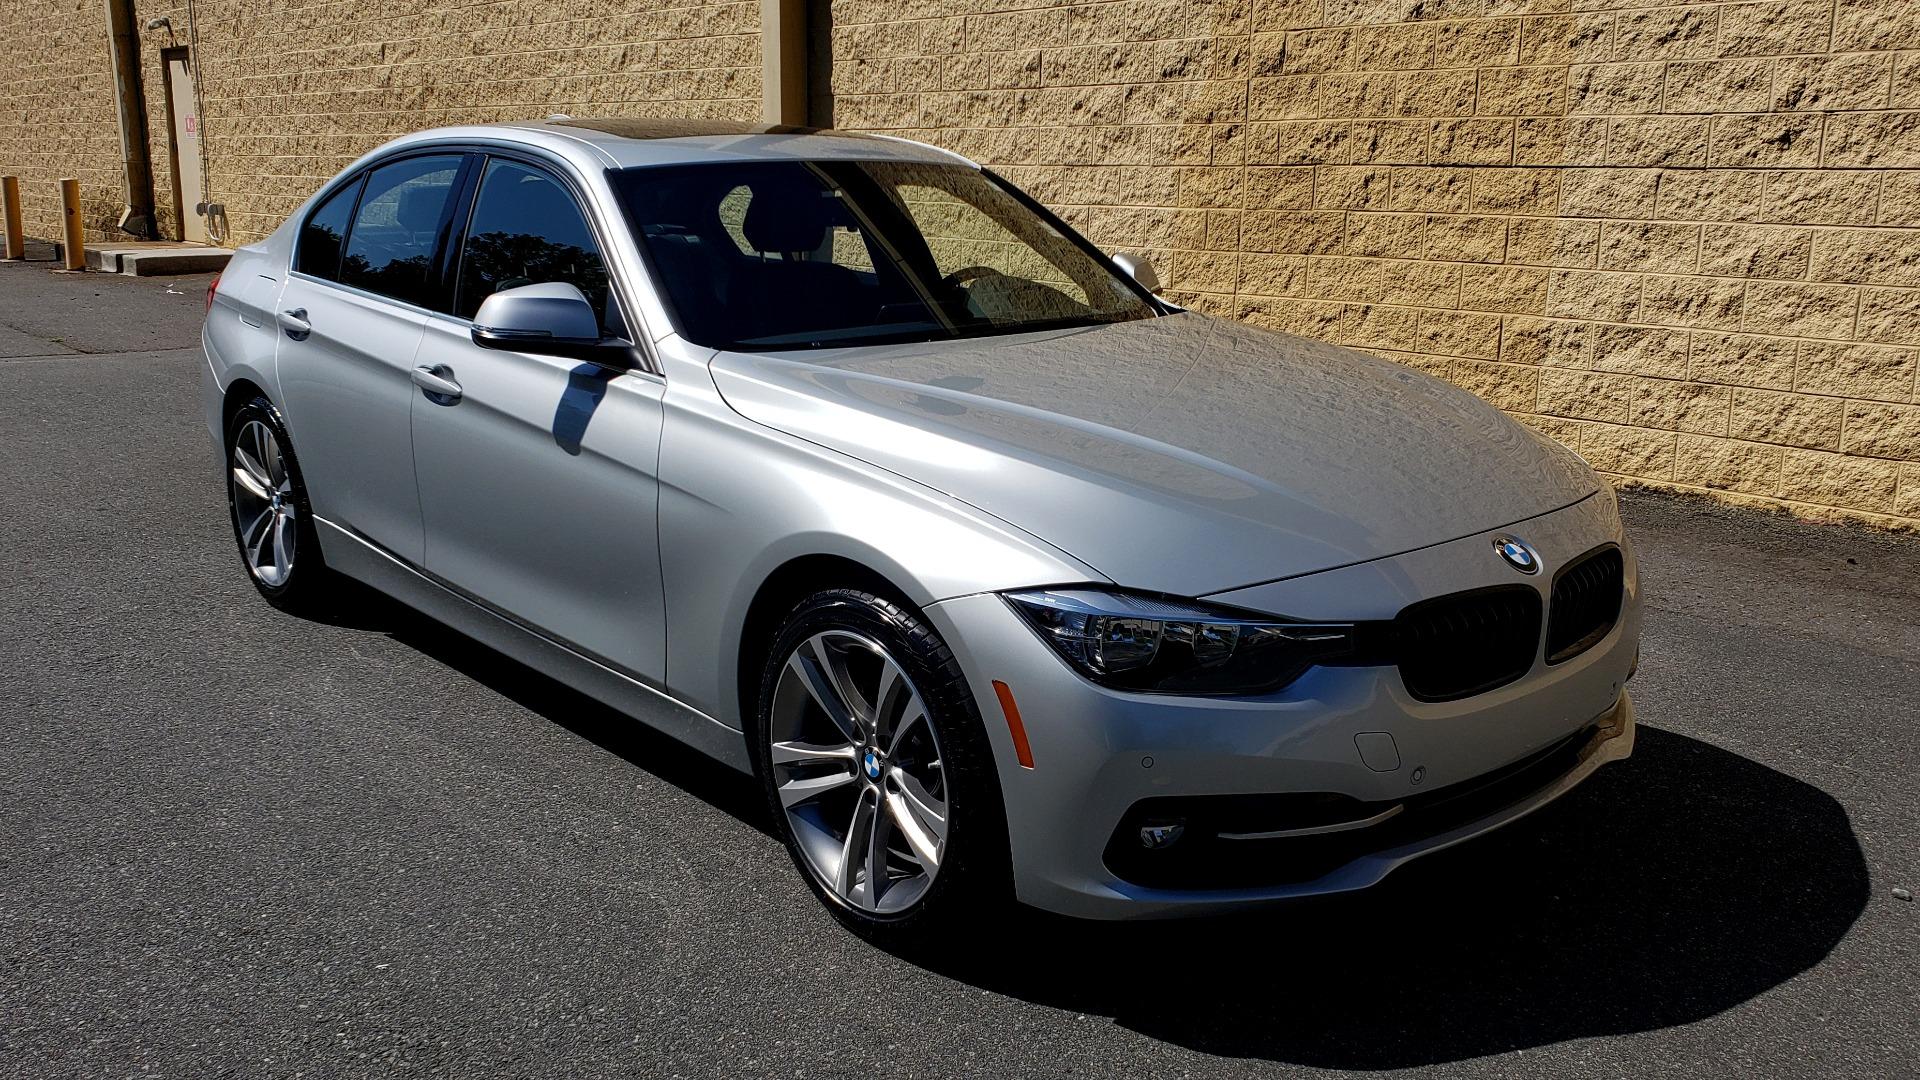 Used 2017 BMW 3 SERIES 330I SPORT SEDAN / DRVR ASST PKG / SUNROOF / REARVIEW for sale Sold at Formula Imports in Charlotte NC 28227 4